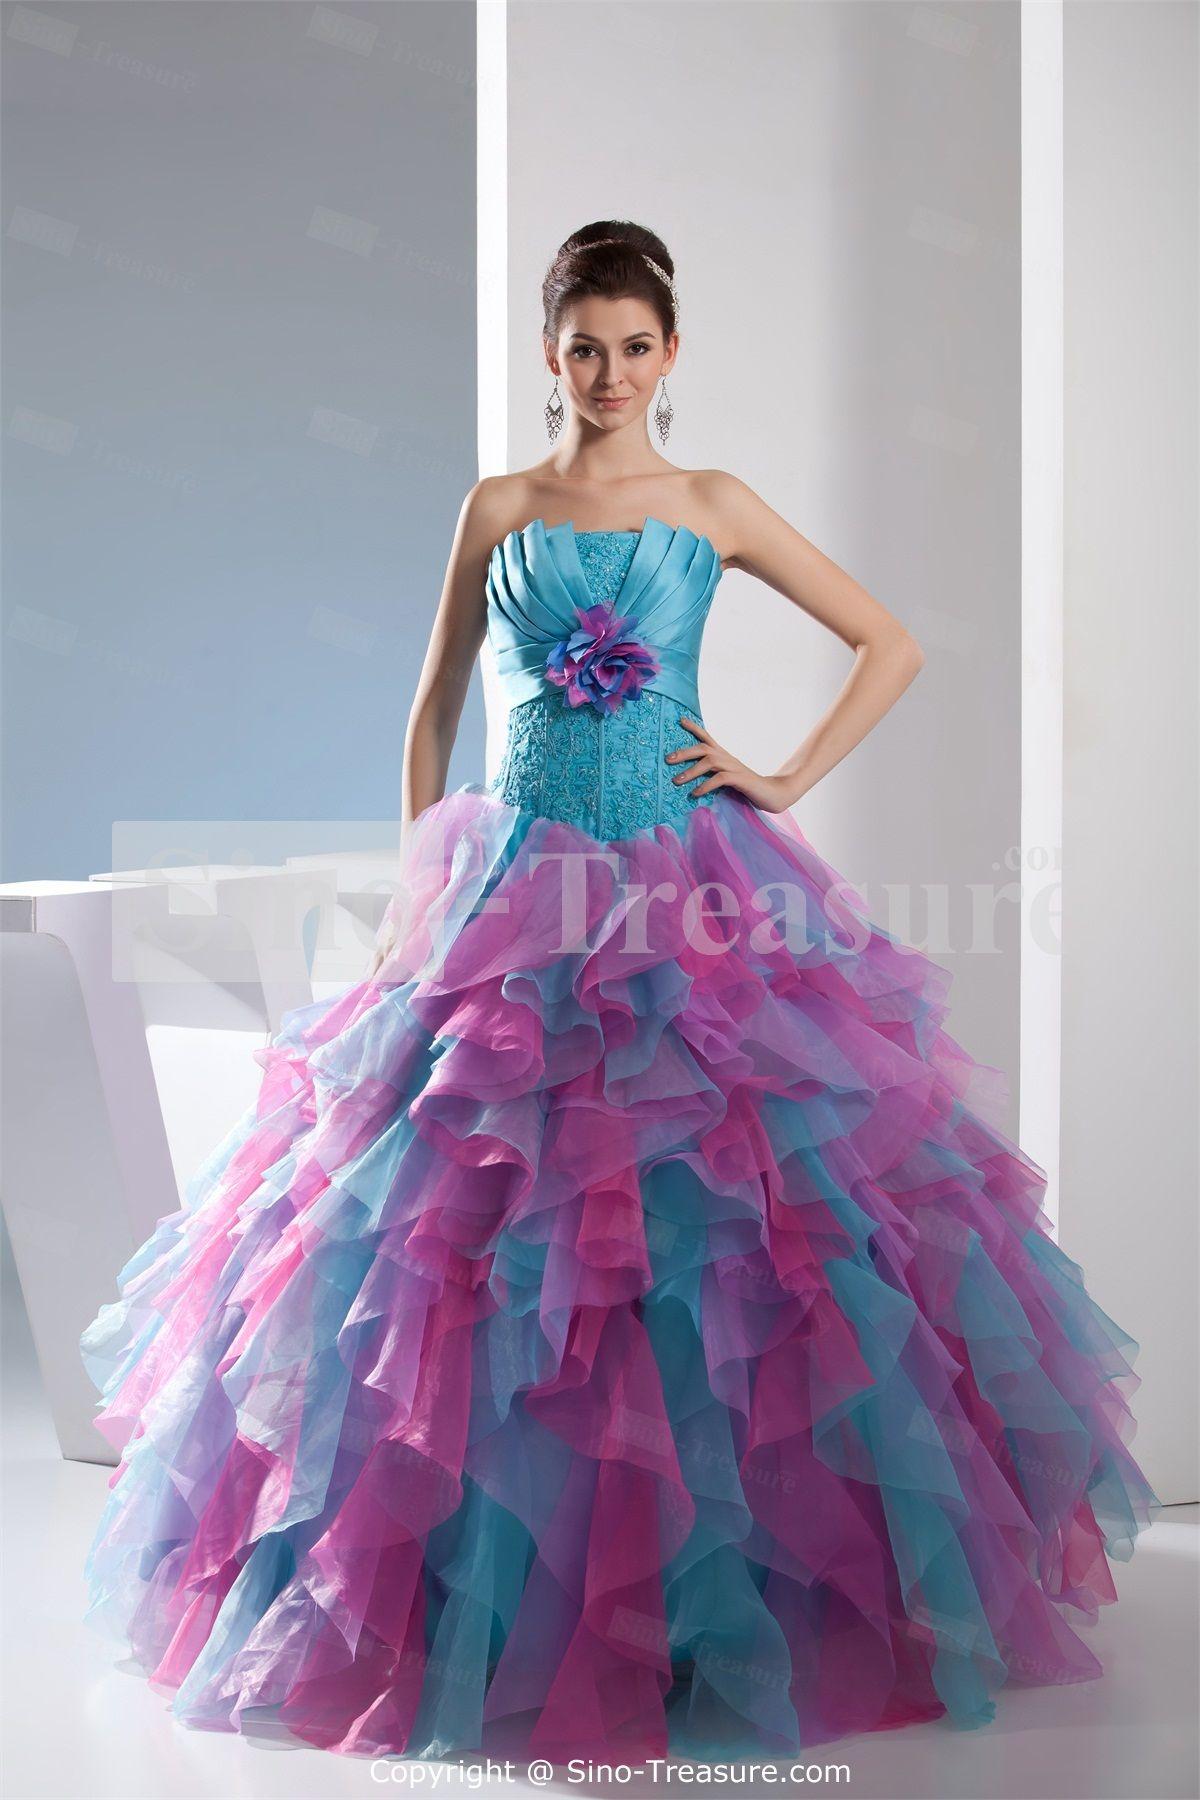 0fe4821f41134a Beading Strapless Apple Handmade Flower Sleeveless A-Line Prom Dress  Wholesale Price  US 287.99